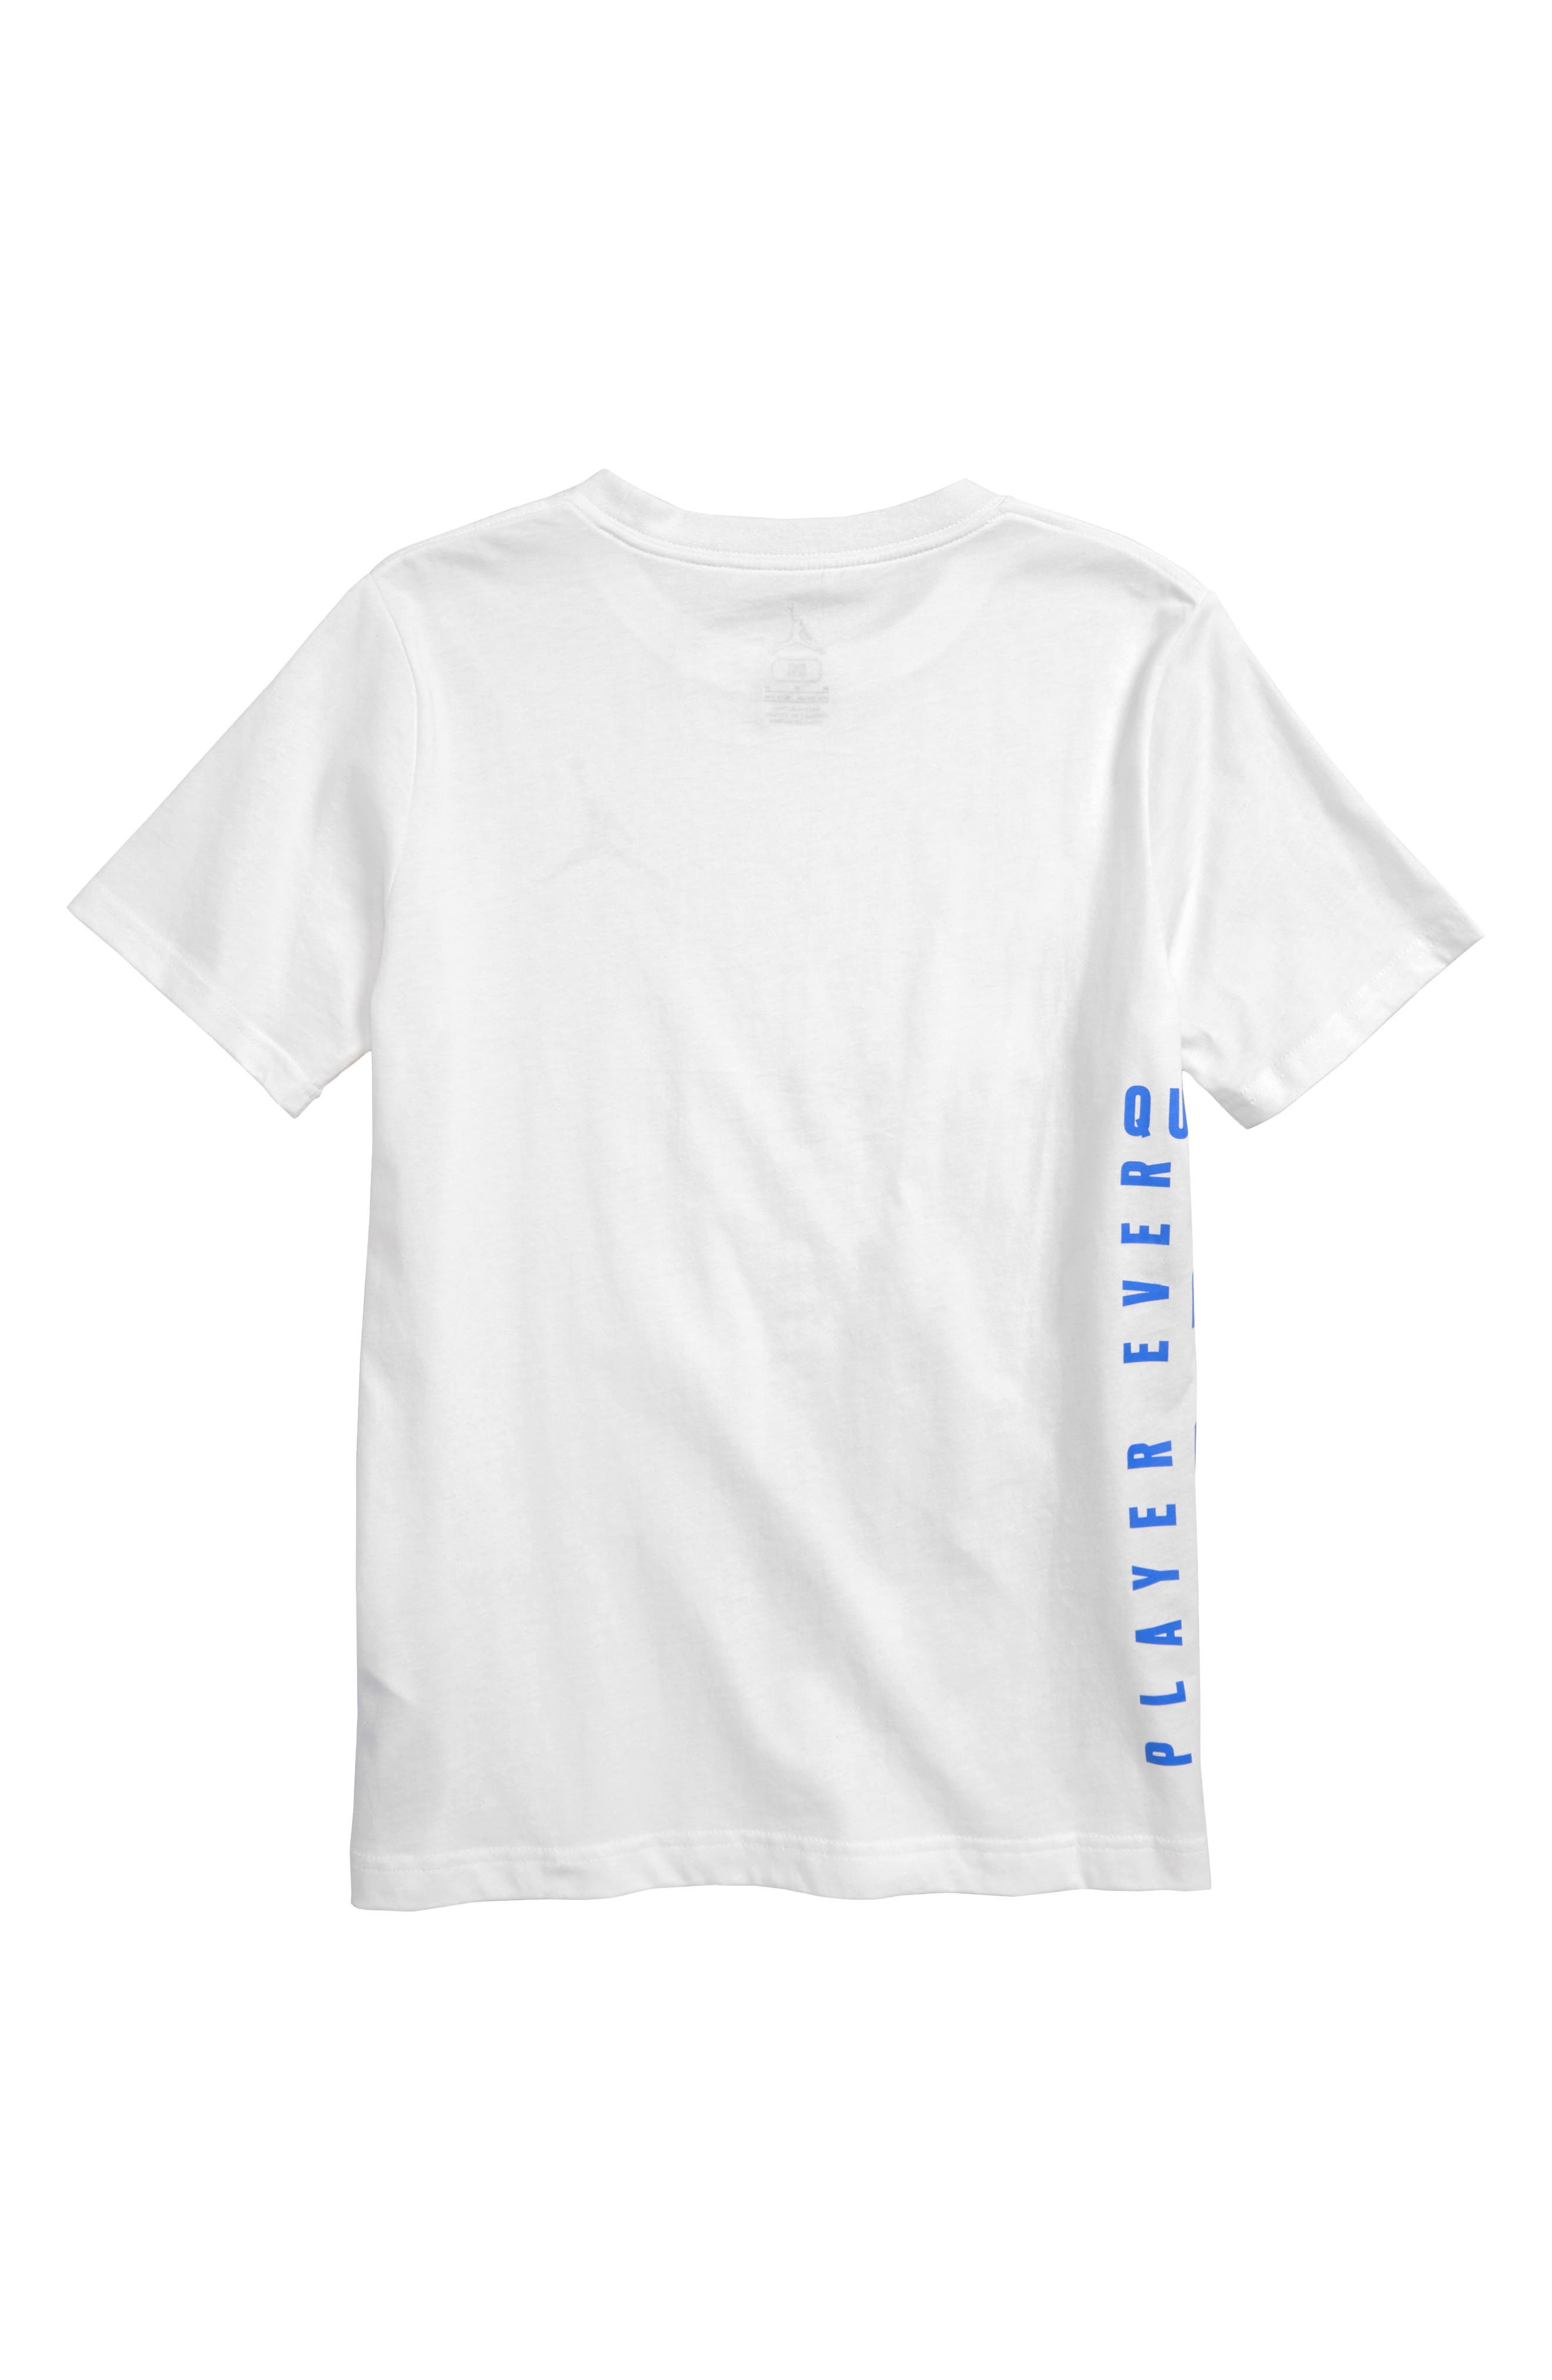 JORDAN, Wings Spin Graphic T-Shirt, Alternate thumbnail 2, color, WHITE